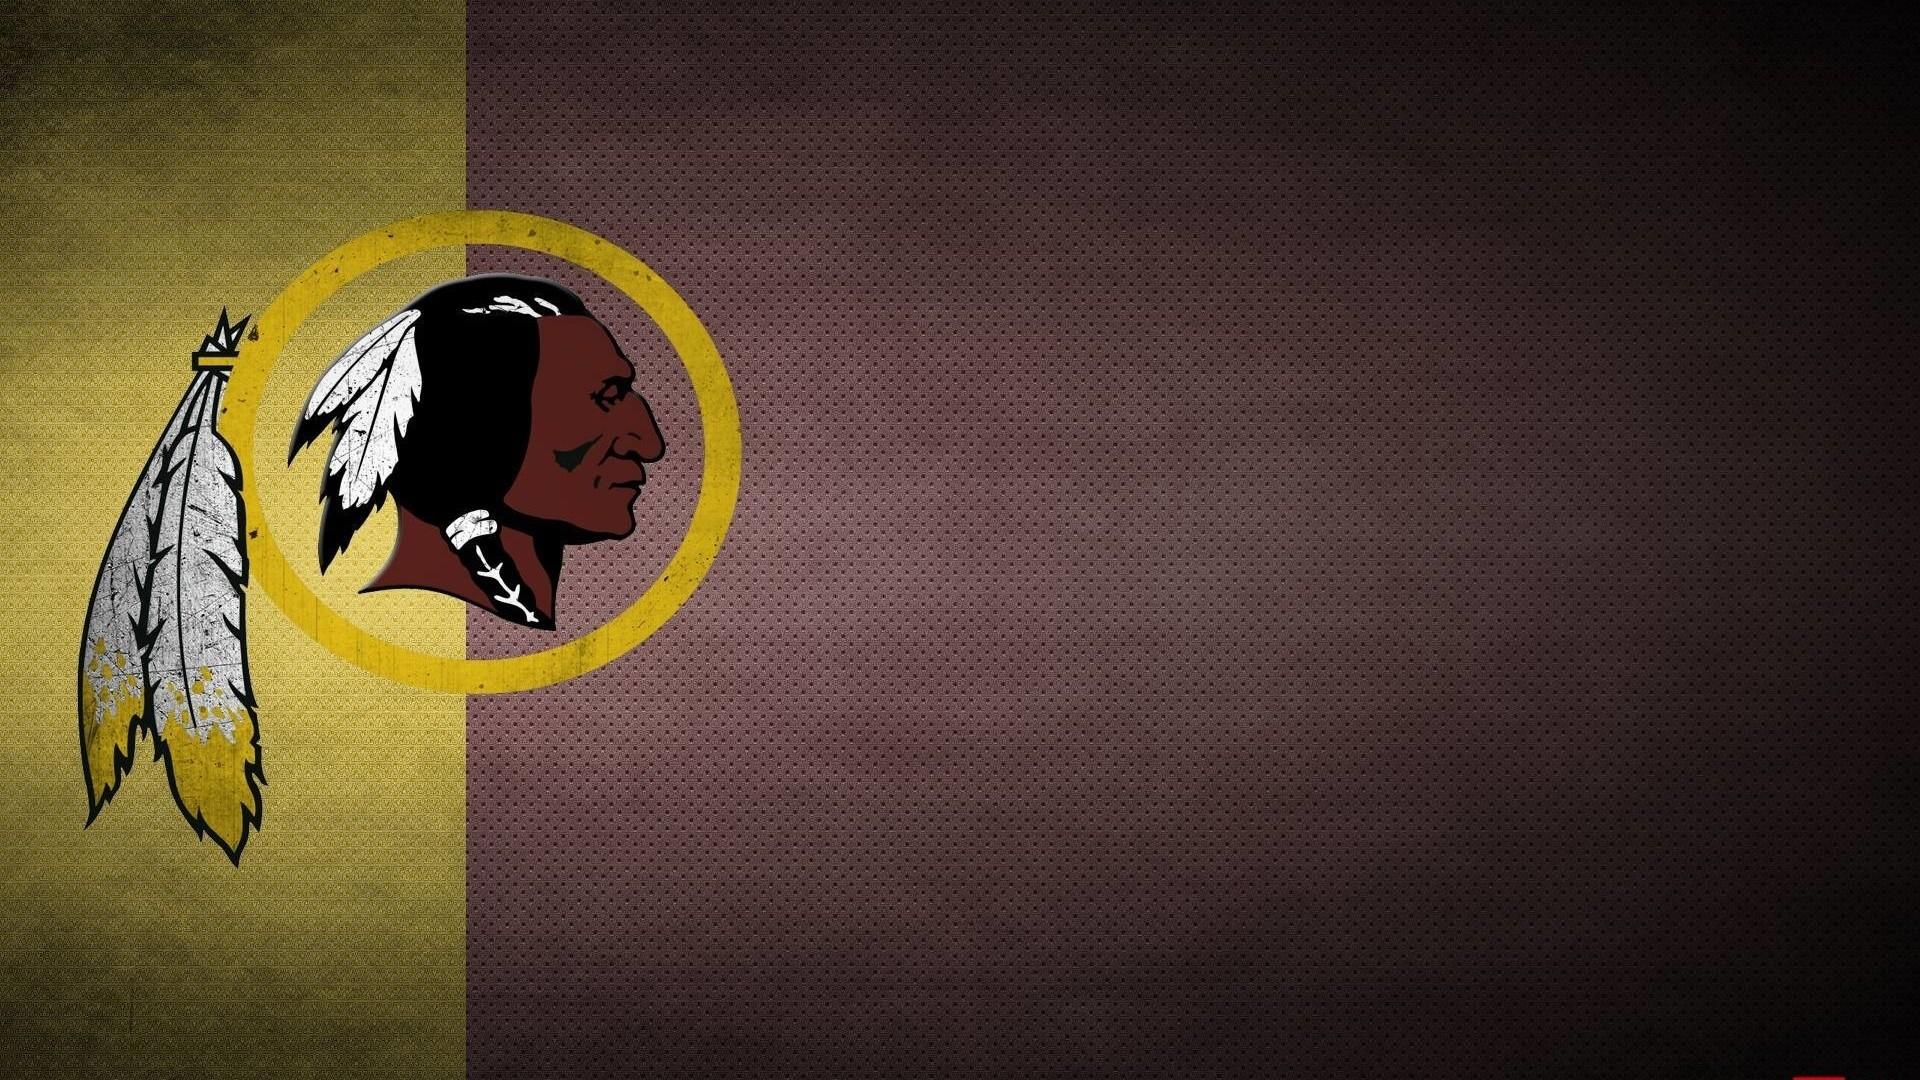 Redskins hd wallpaper download